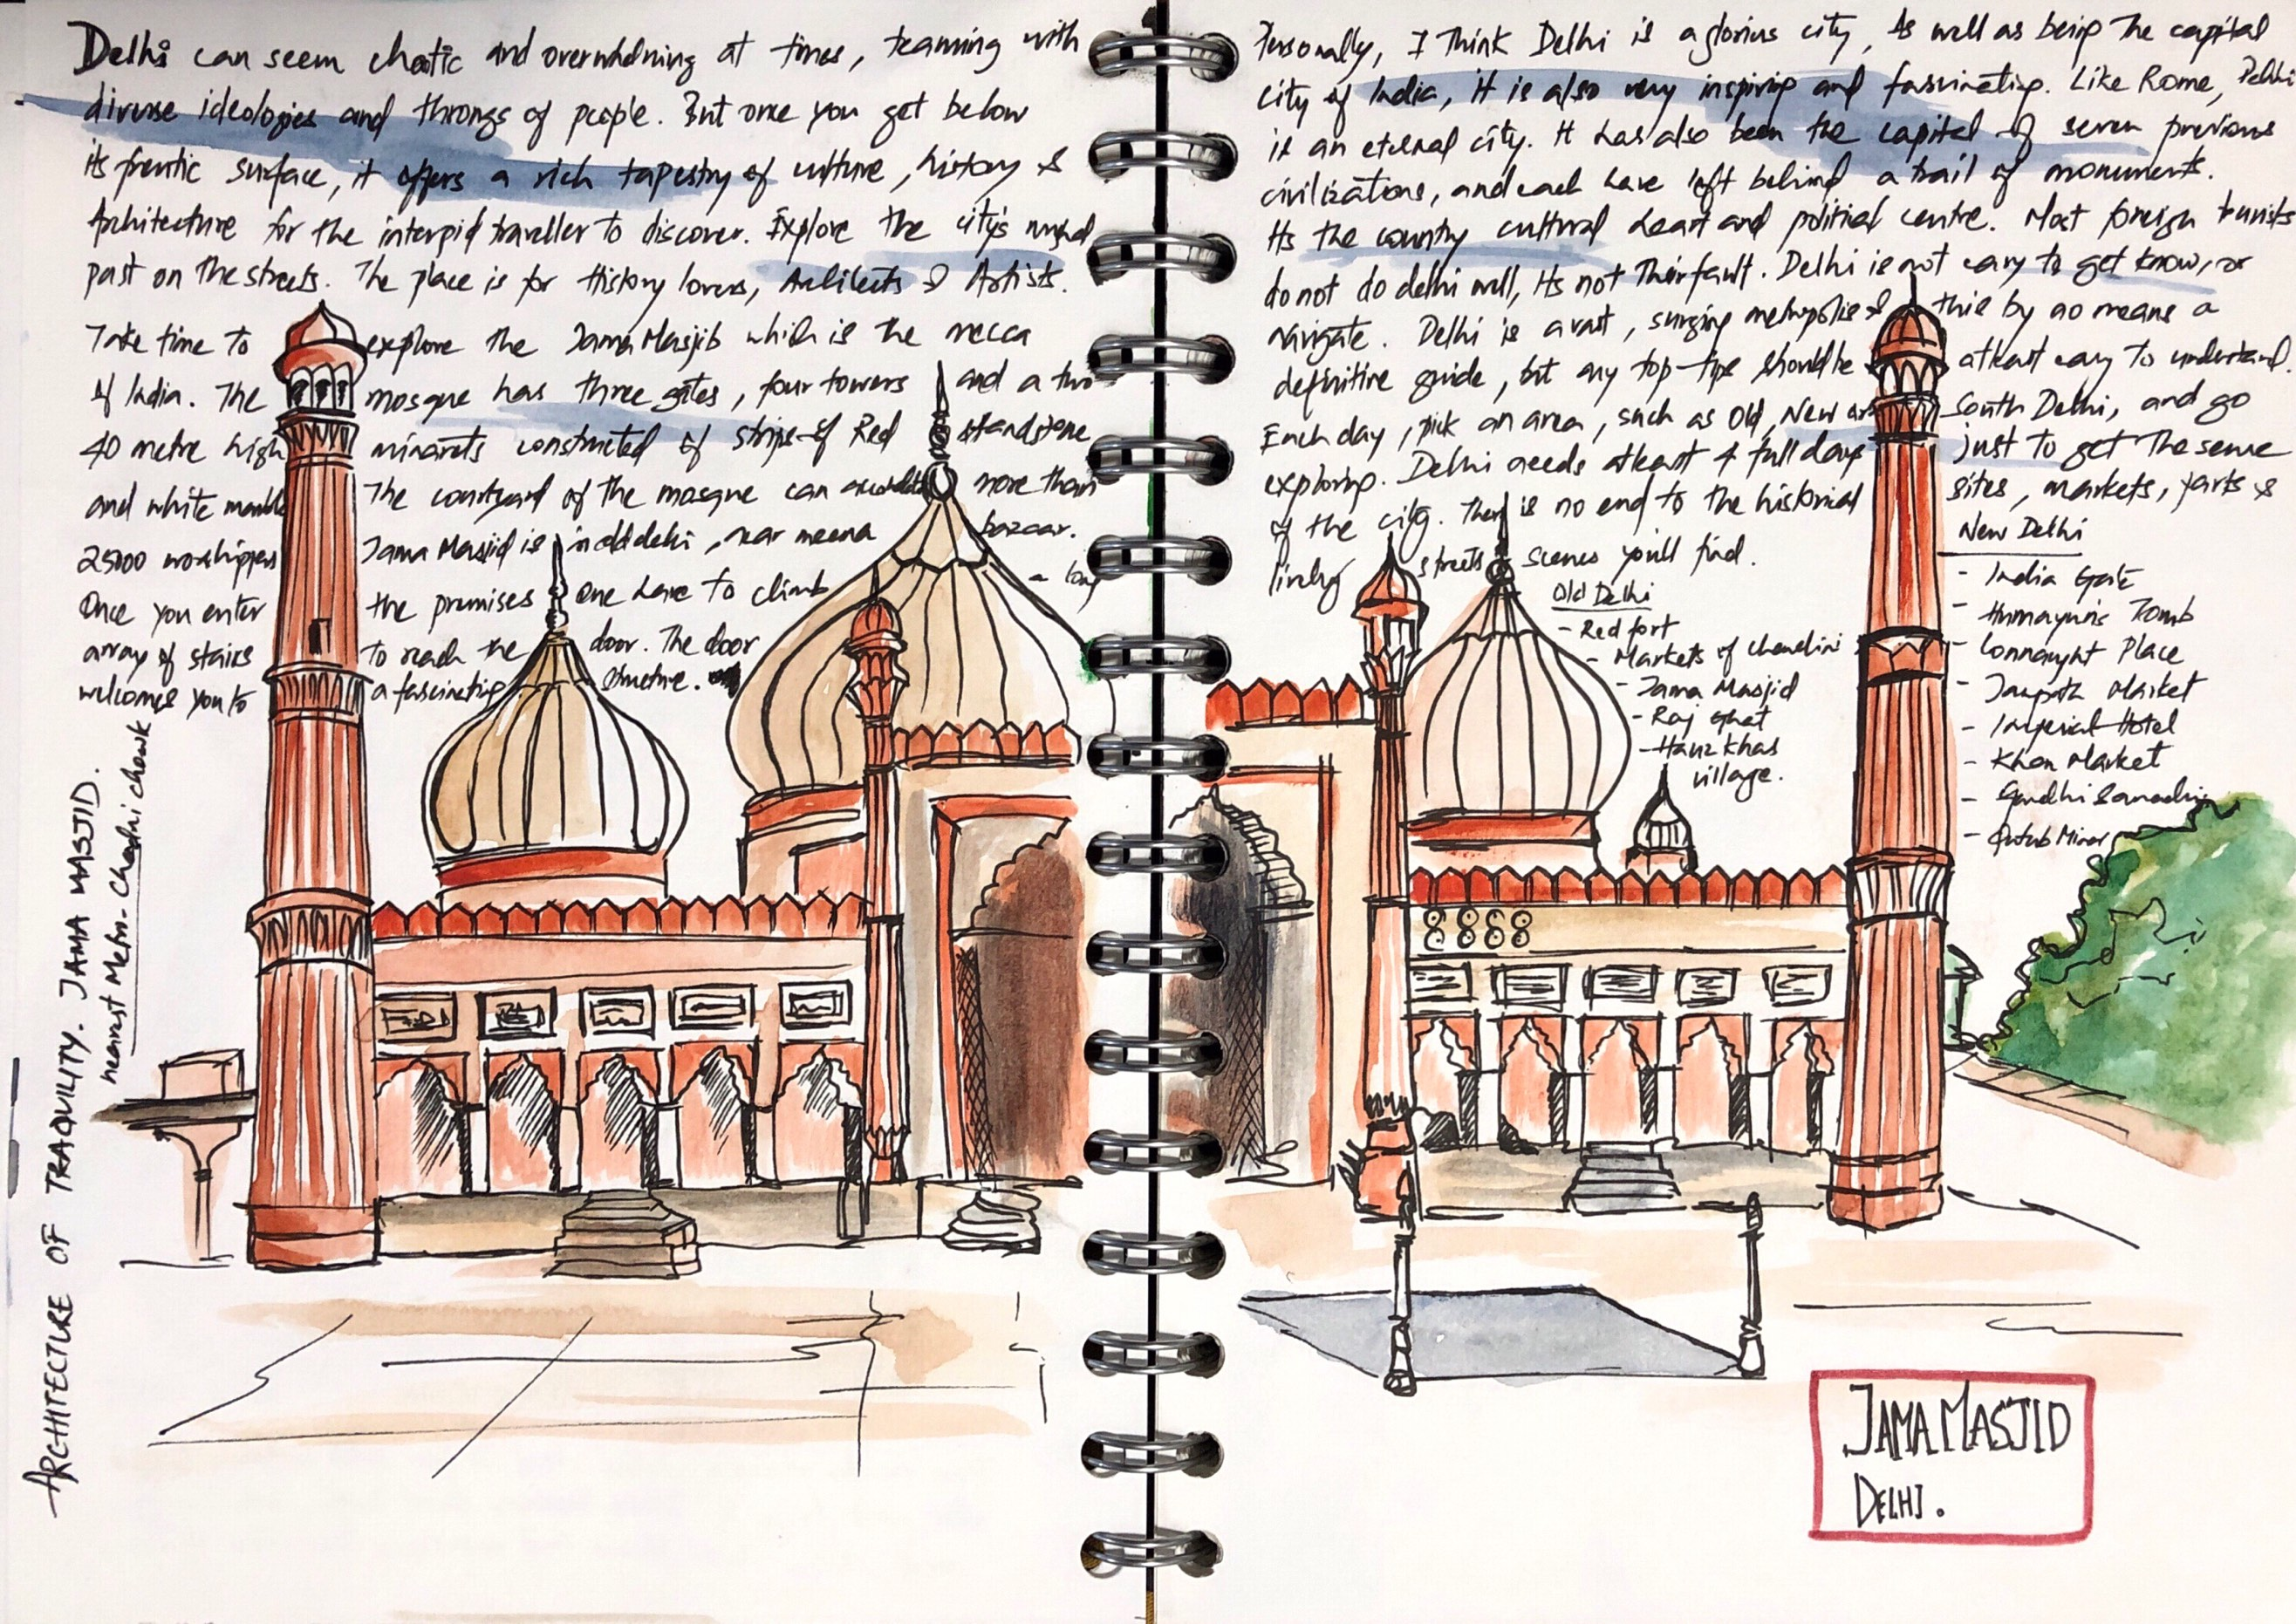 Jama-masjid-front-delhi